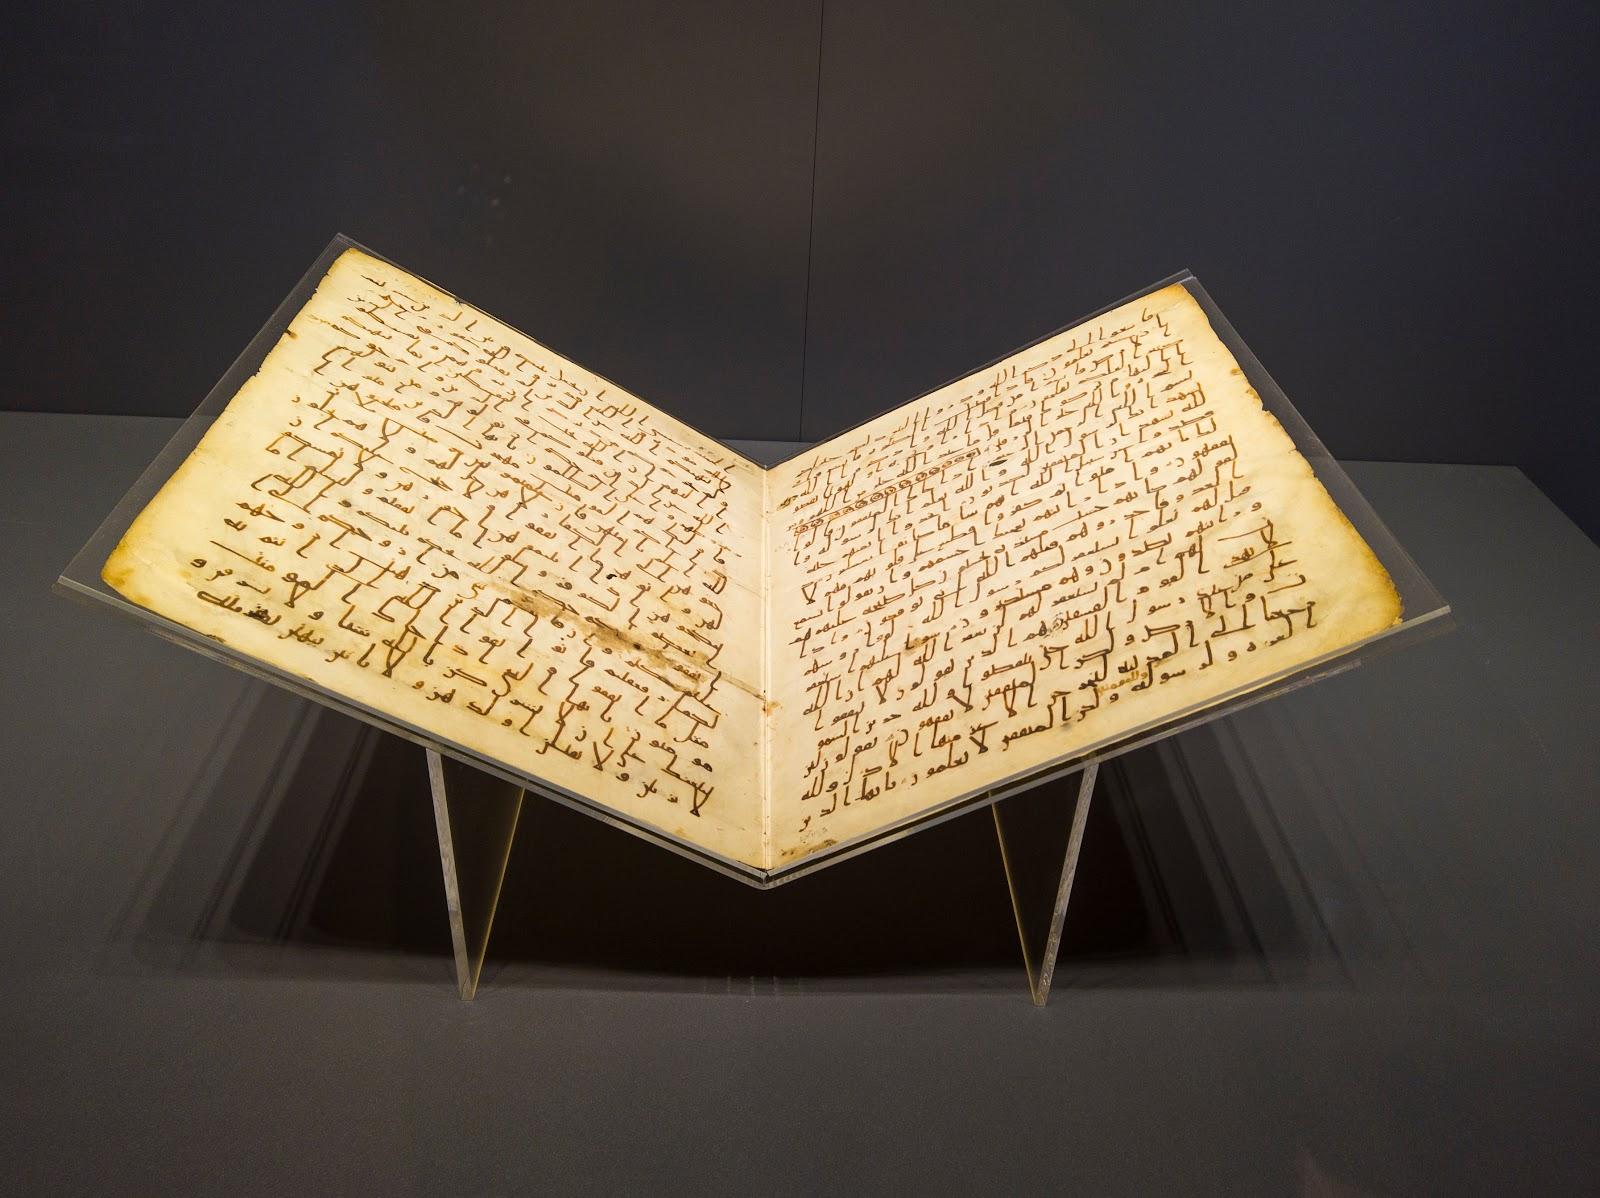 is quran written by muhammad